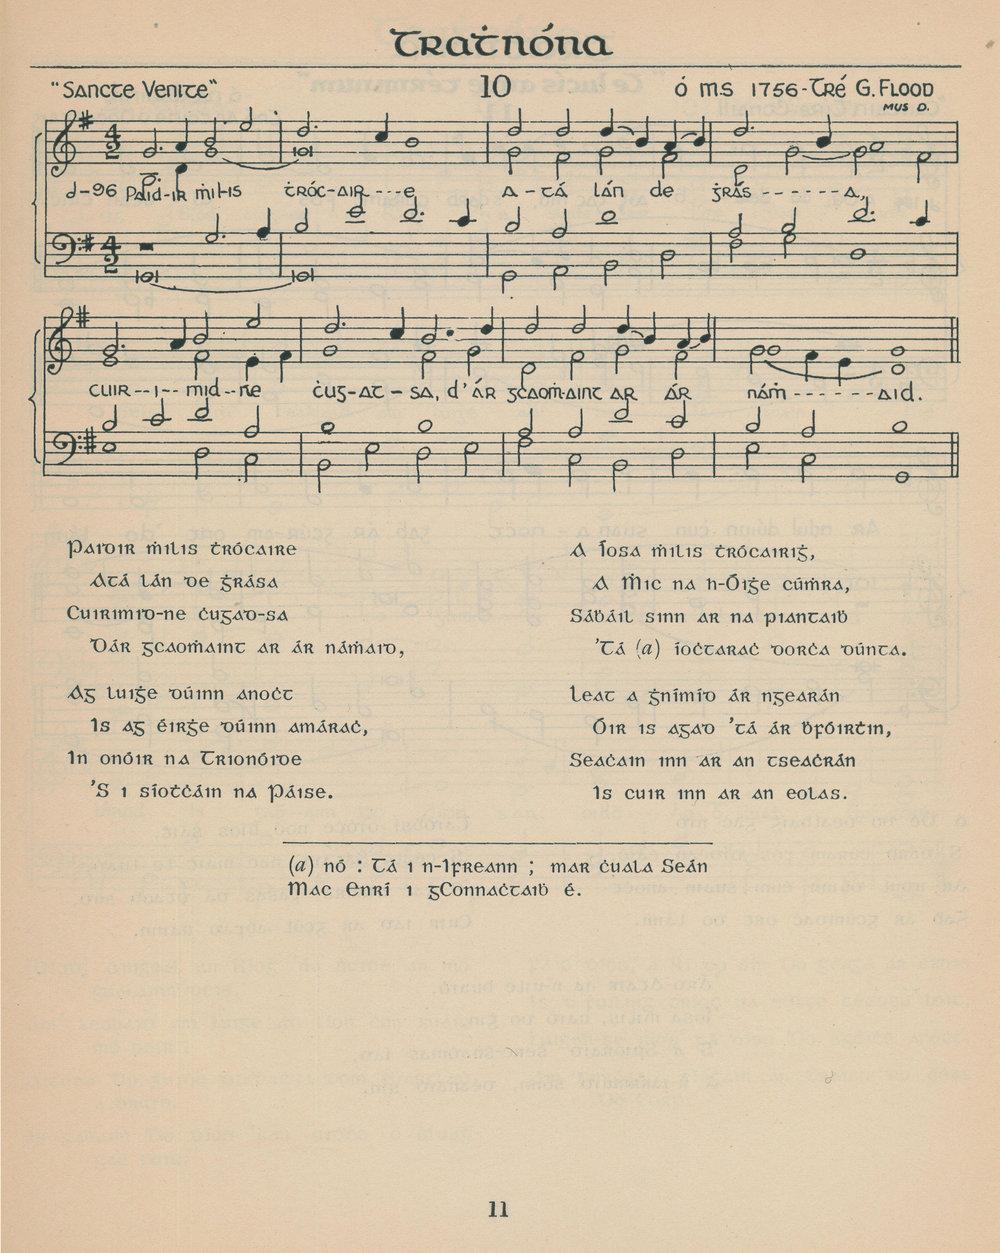 SancteVenite-DantaDe-1928_001a.jpg